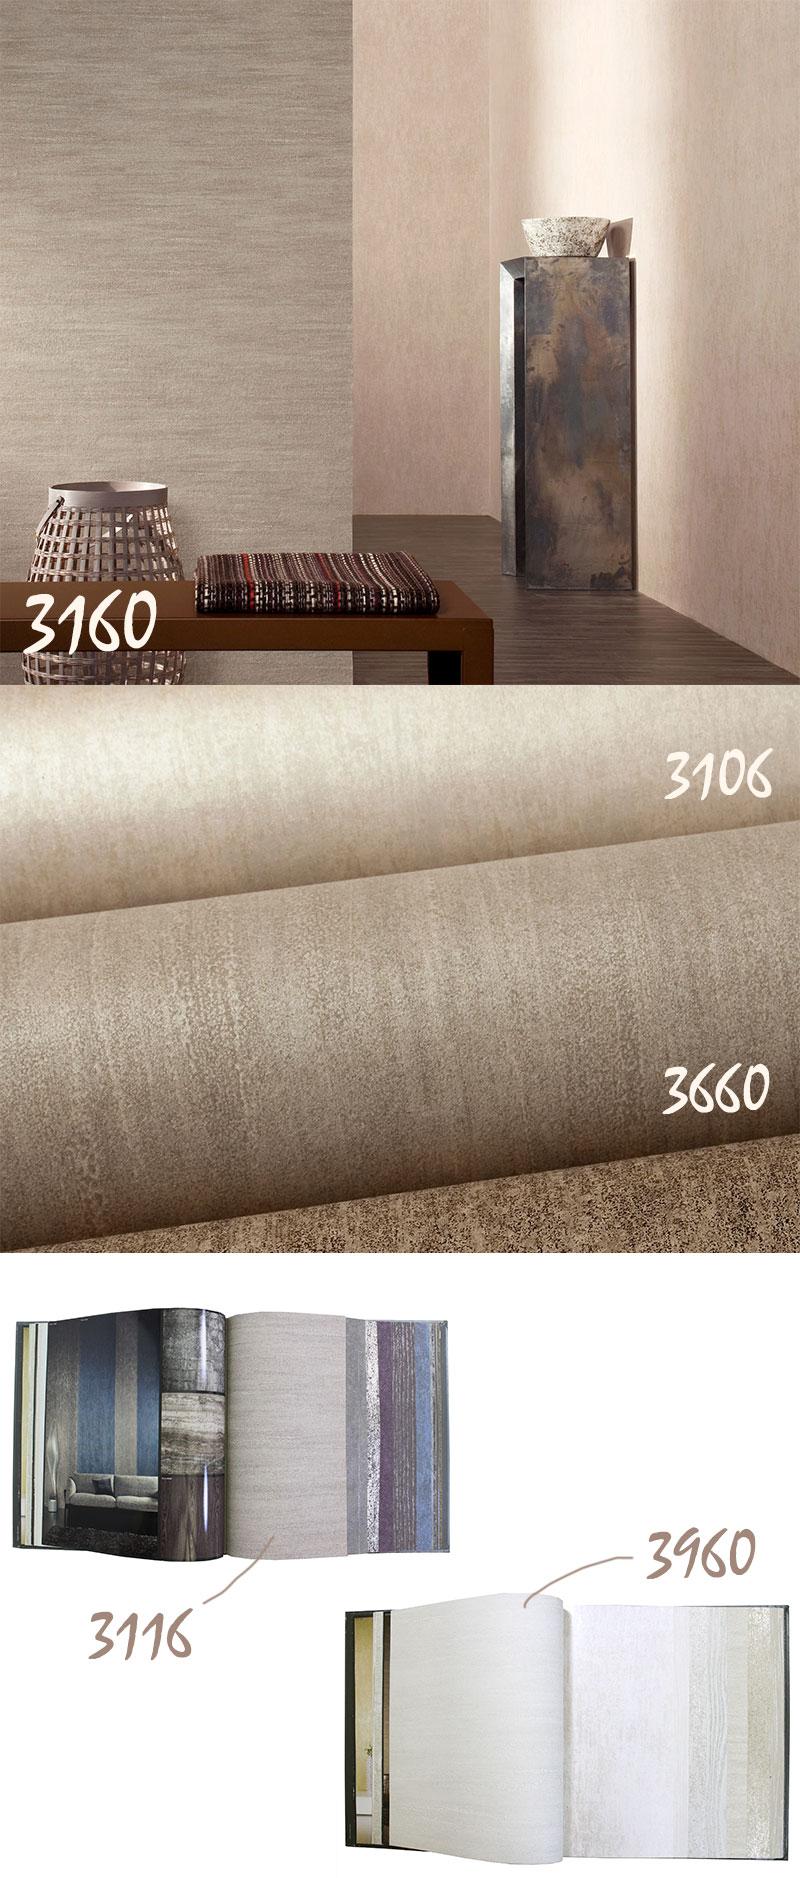 Nonwoven Wallpaper Diy Wallpaper Rent Again Nonwoven Fabric Wallpapers  Fleece Wallpaper Peel Off Wallpaper Fleece Fabric Post Peel Off Tack  Imported